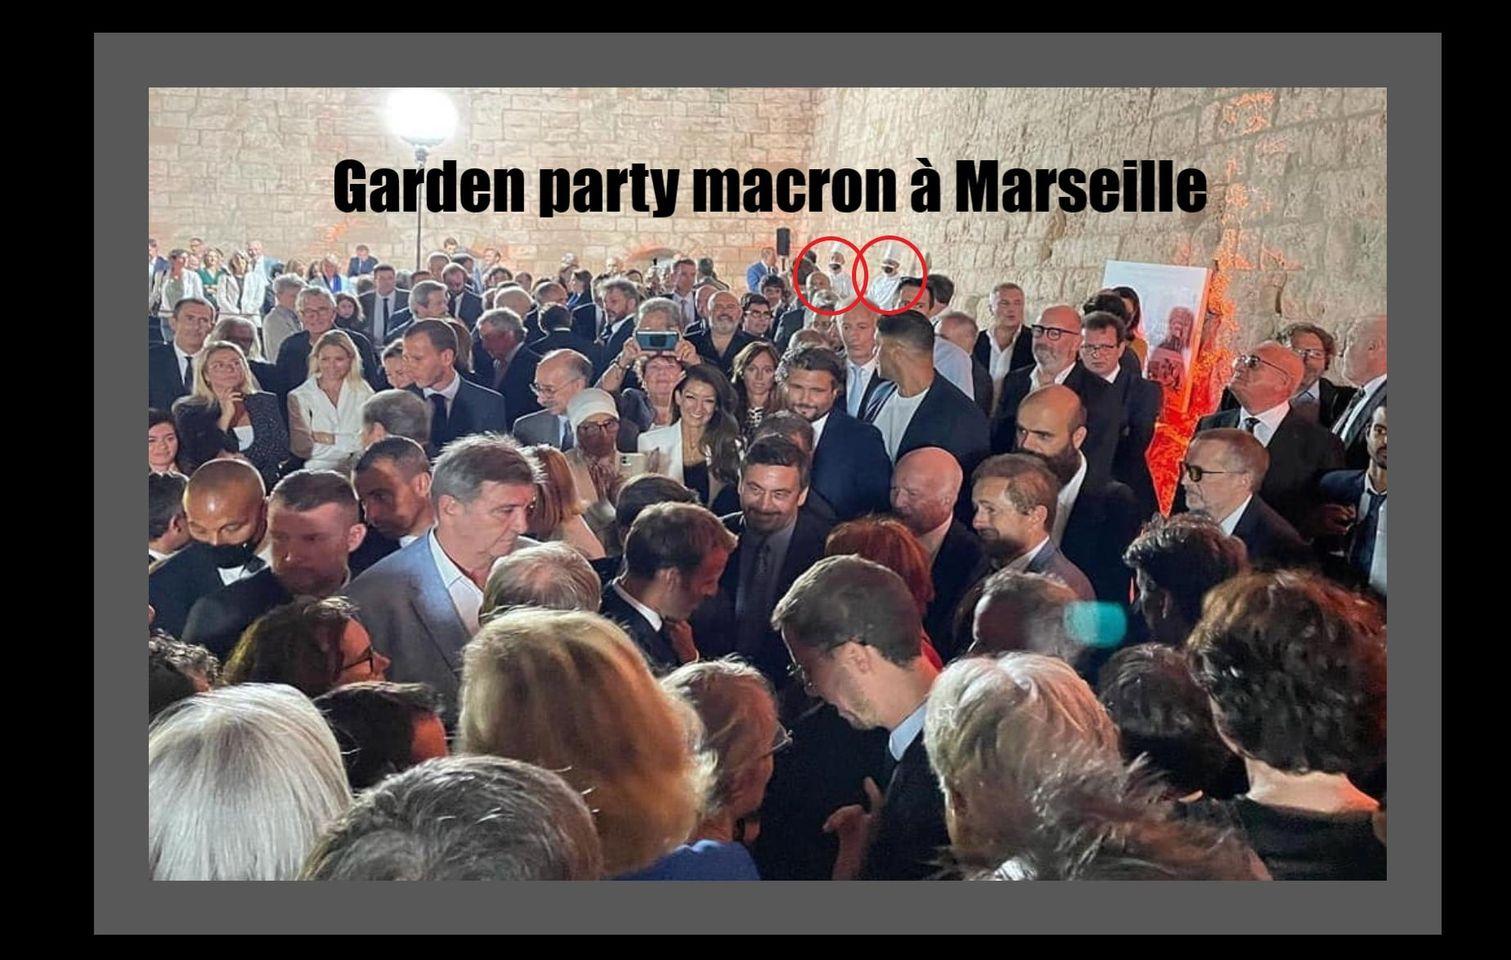 macron-port-du-masque-marseille